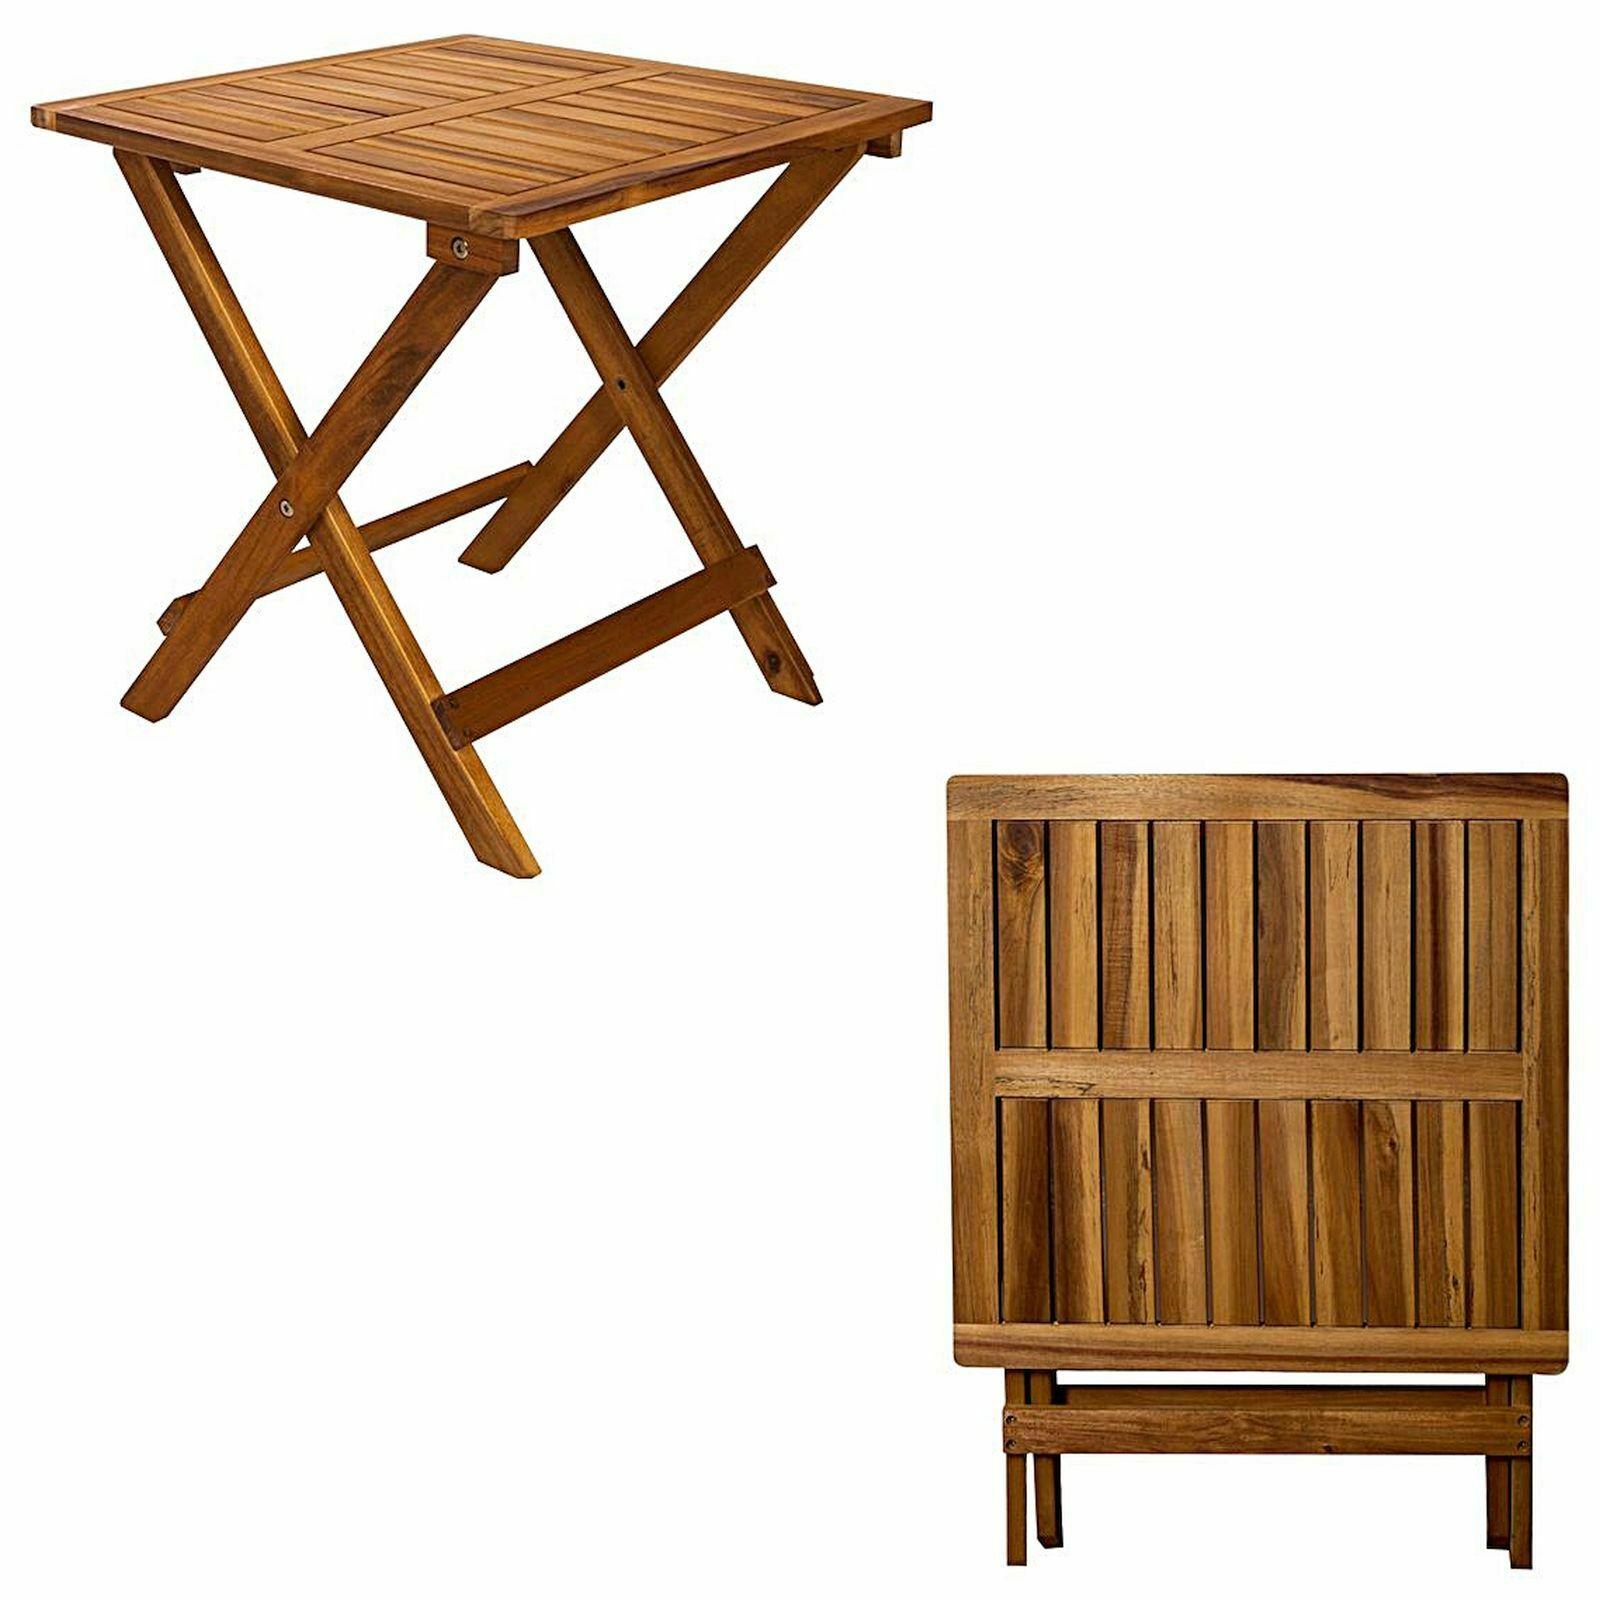 Full Size of Balkontisch Klappbar Holz Klapptisch Gartentisch Tisch Ausklappbares Bett Ausklappbar Wohnzimmer Balkontisch Klappbar